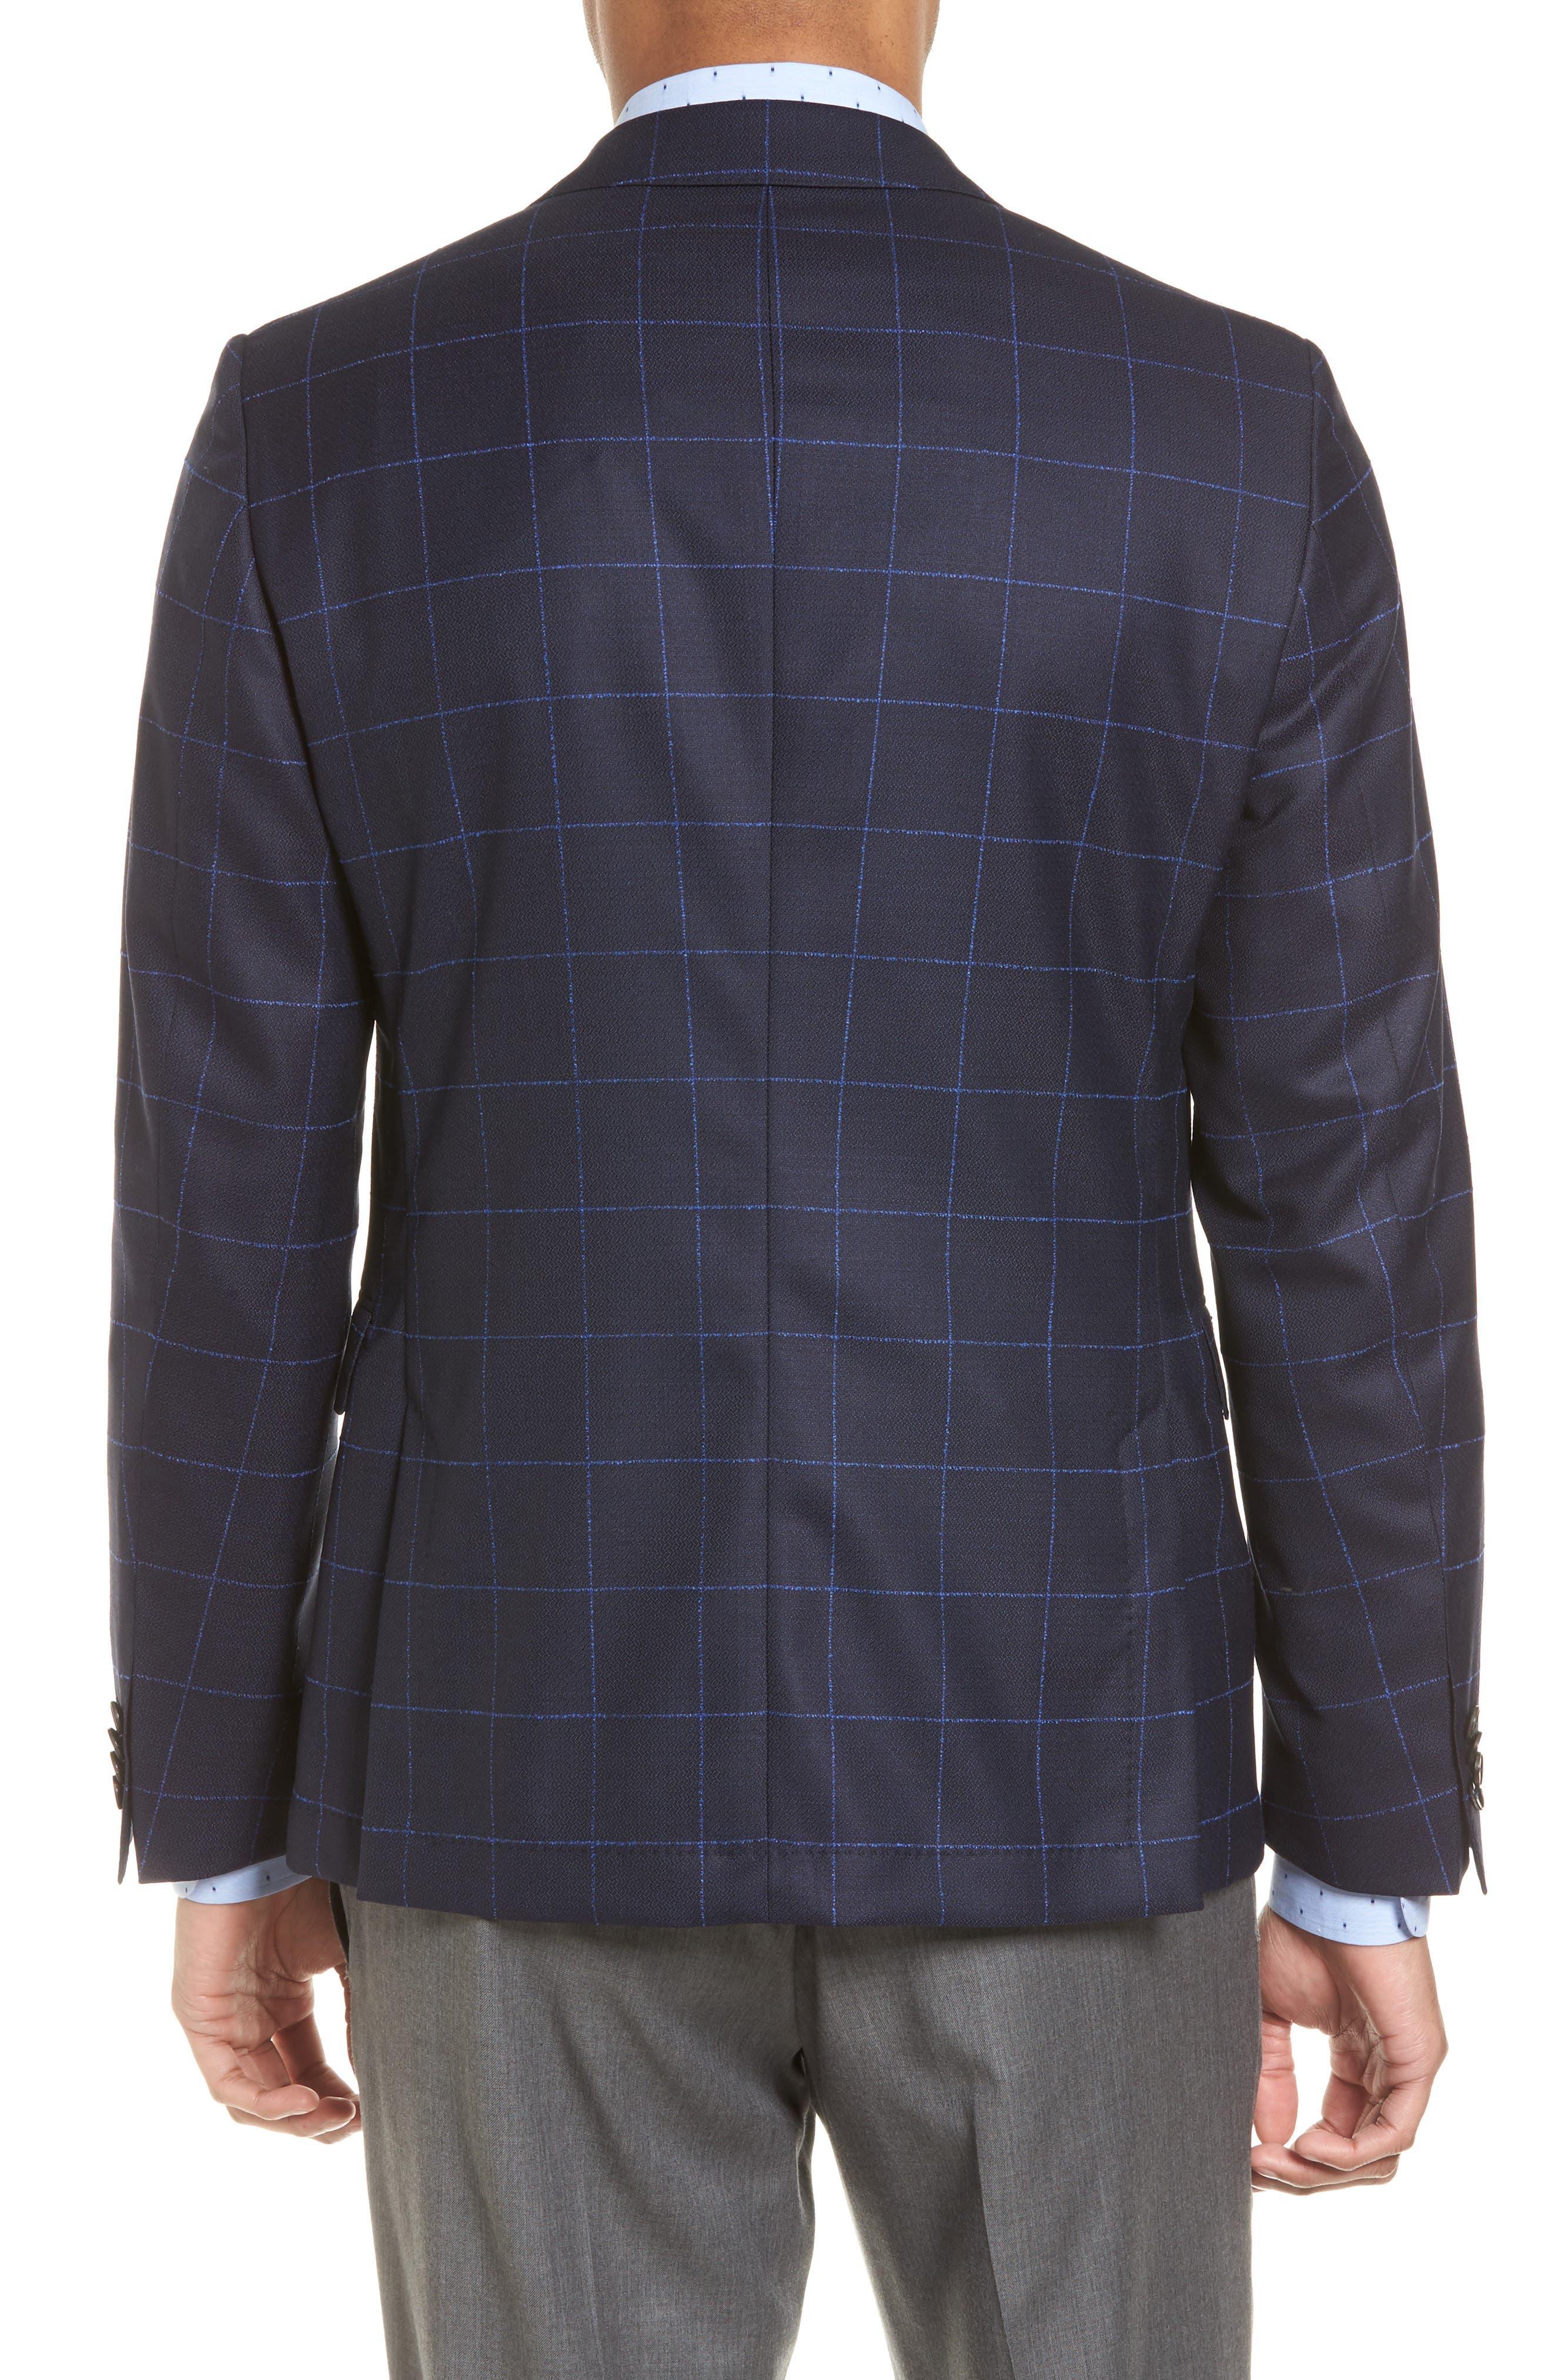 Nordstrom x BOSS Nobis Trim Fit Check Wool Sport Coat,                             Alternate thumbnail 2, color,